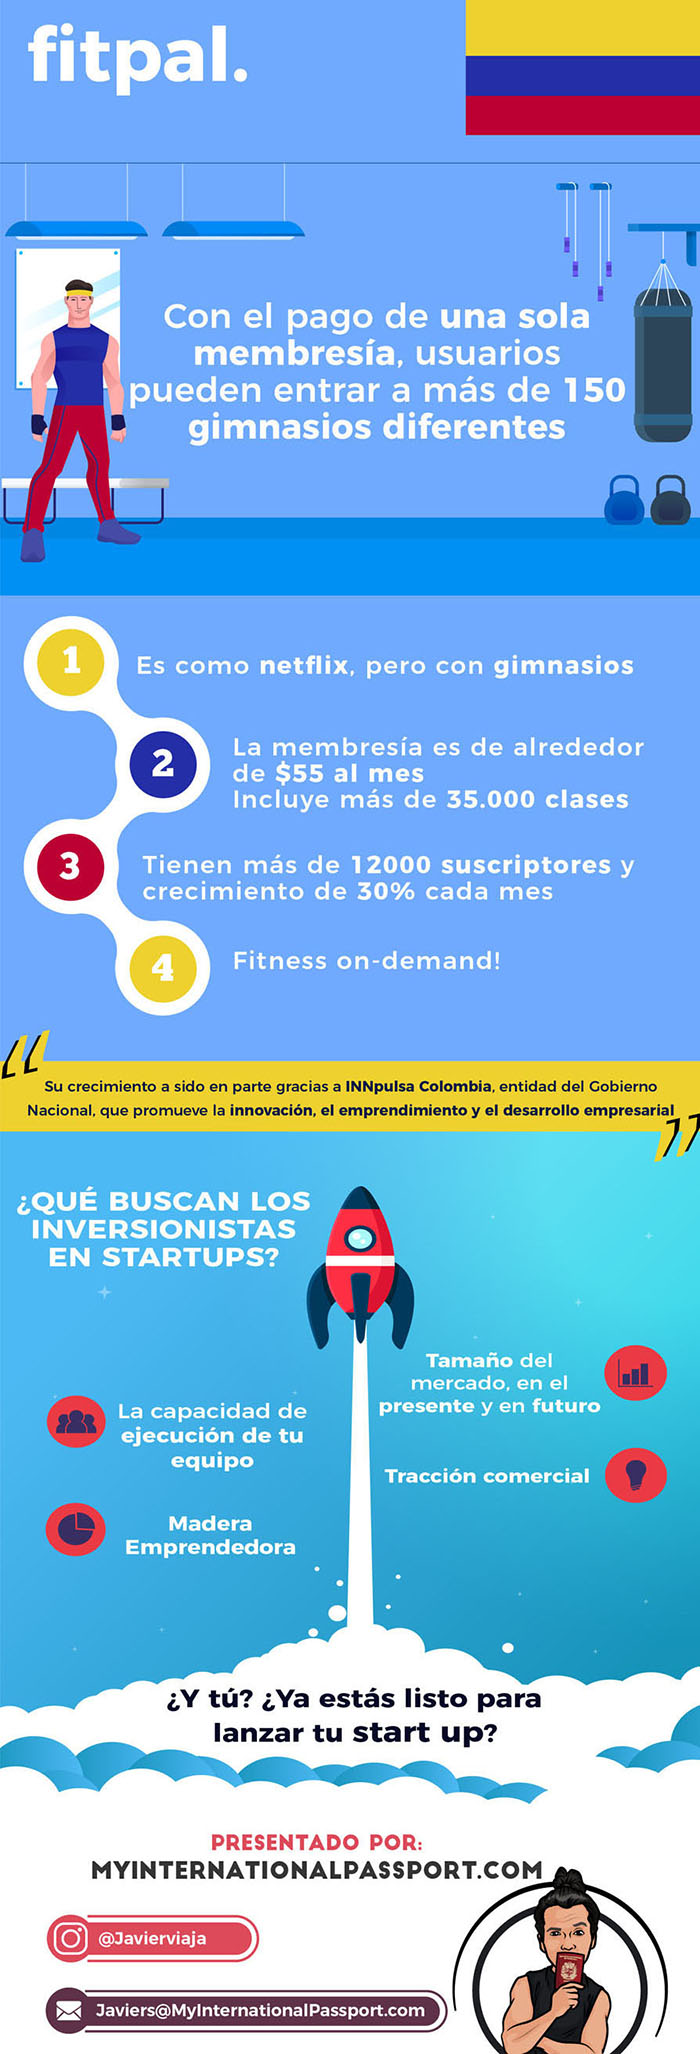 Las 7 start-ups que prometen liderar Latinoamérica en 2019